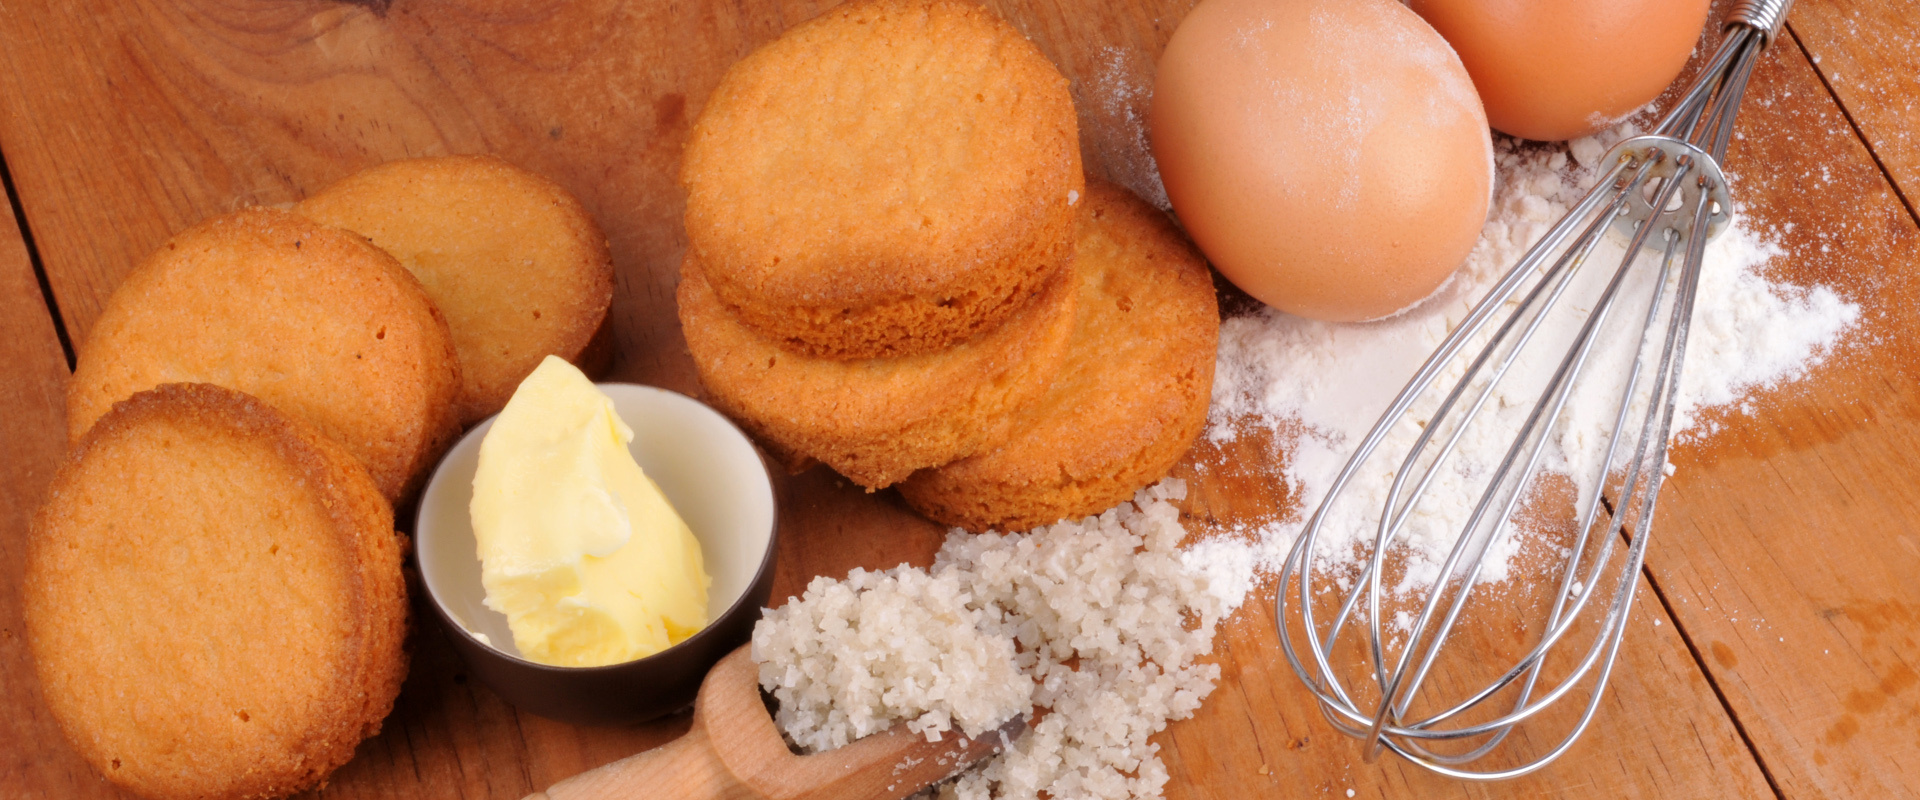 francia sós vajas keksz cover ok